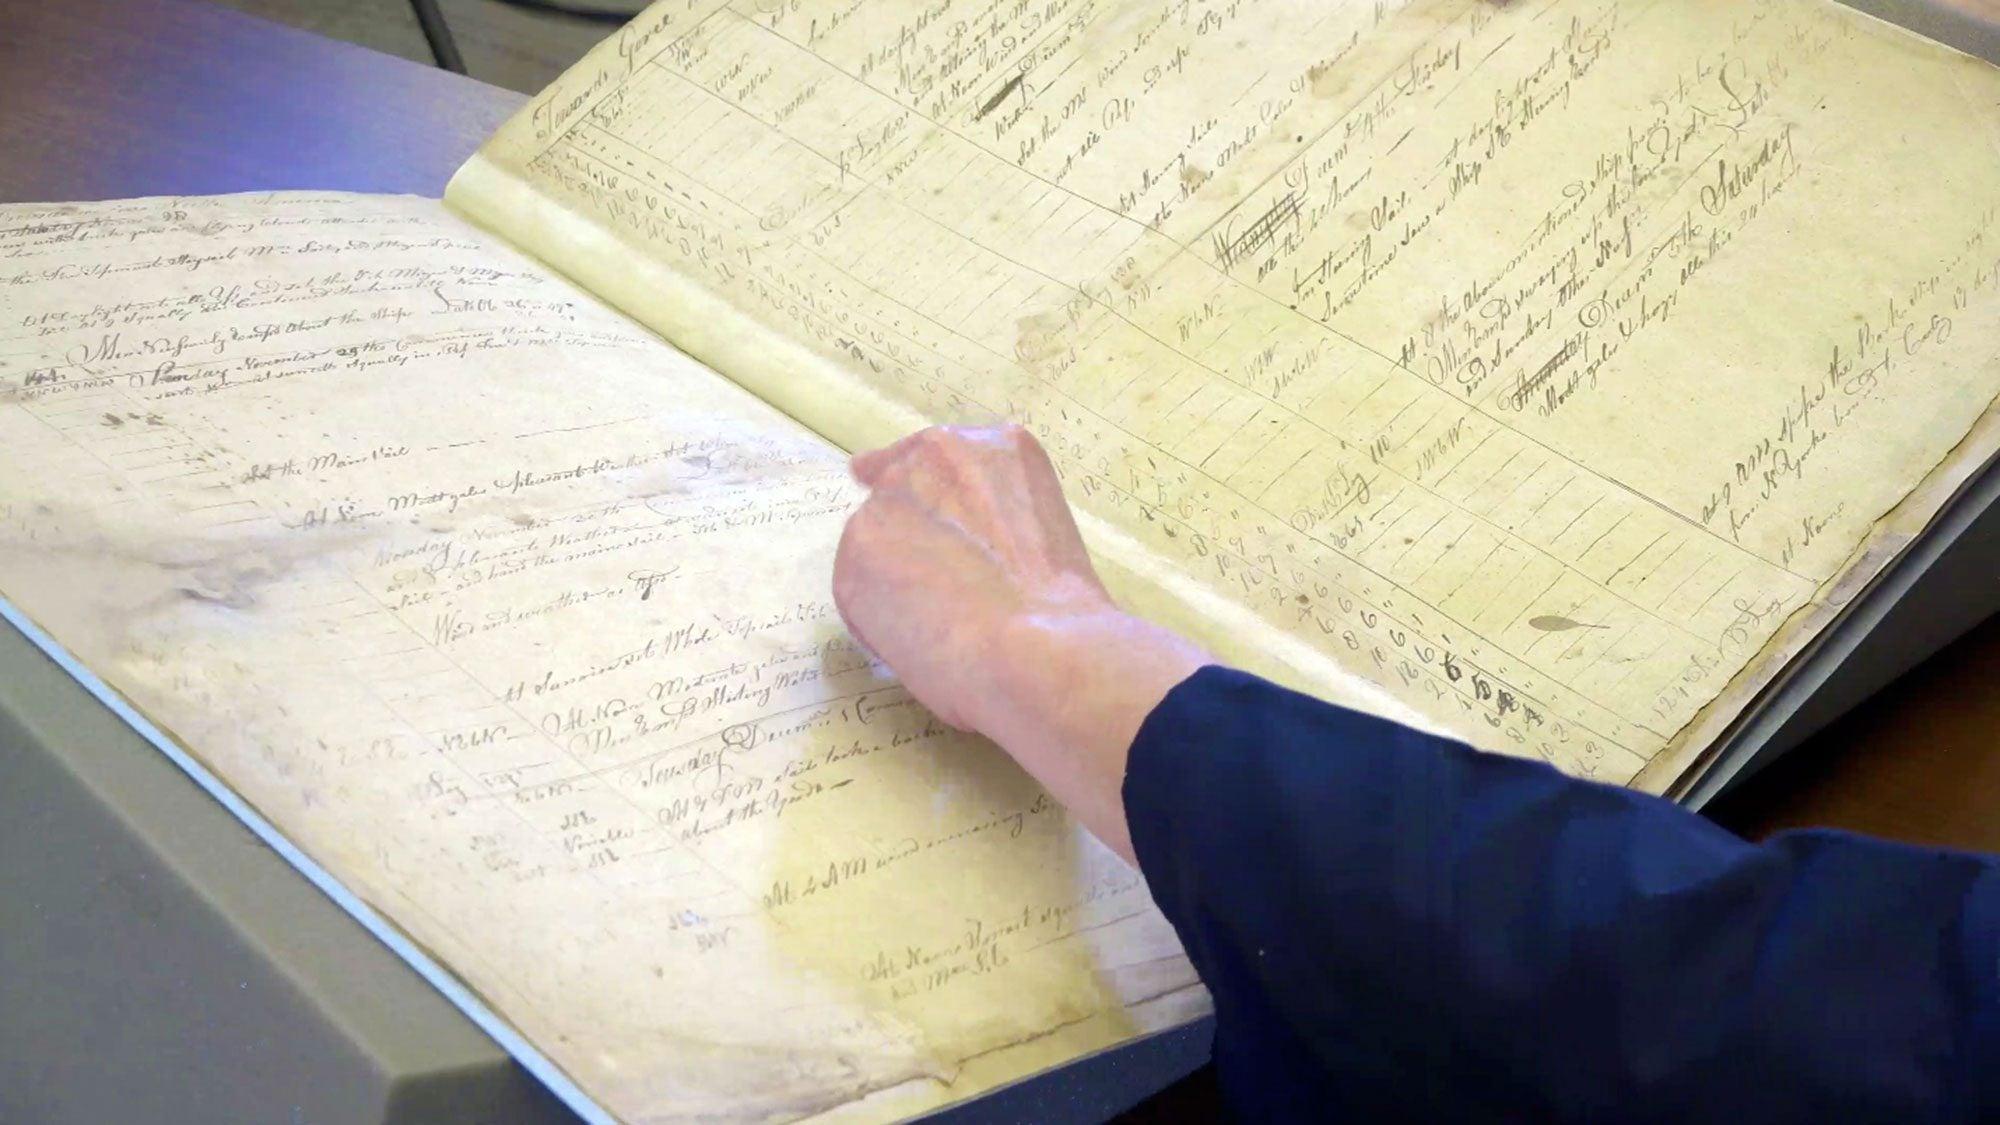 A woman flips through an old ship's logbook.